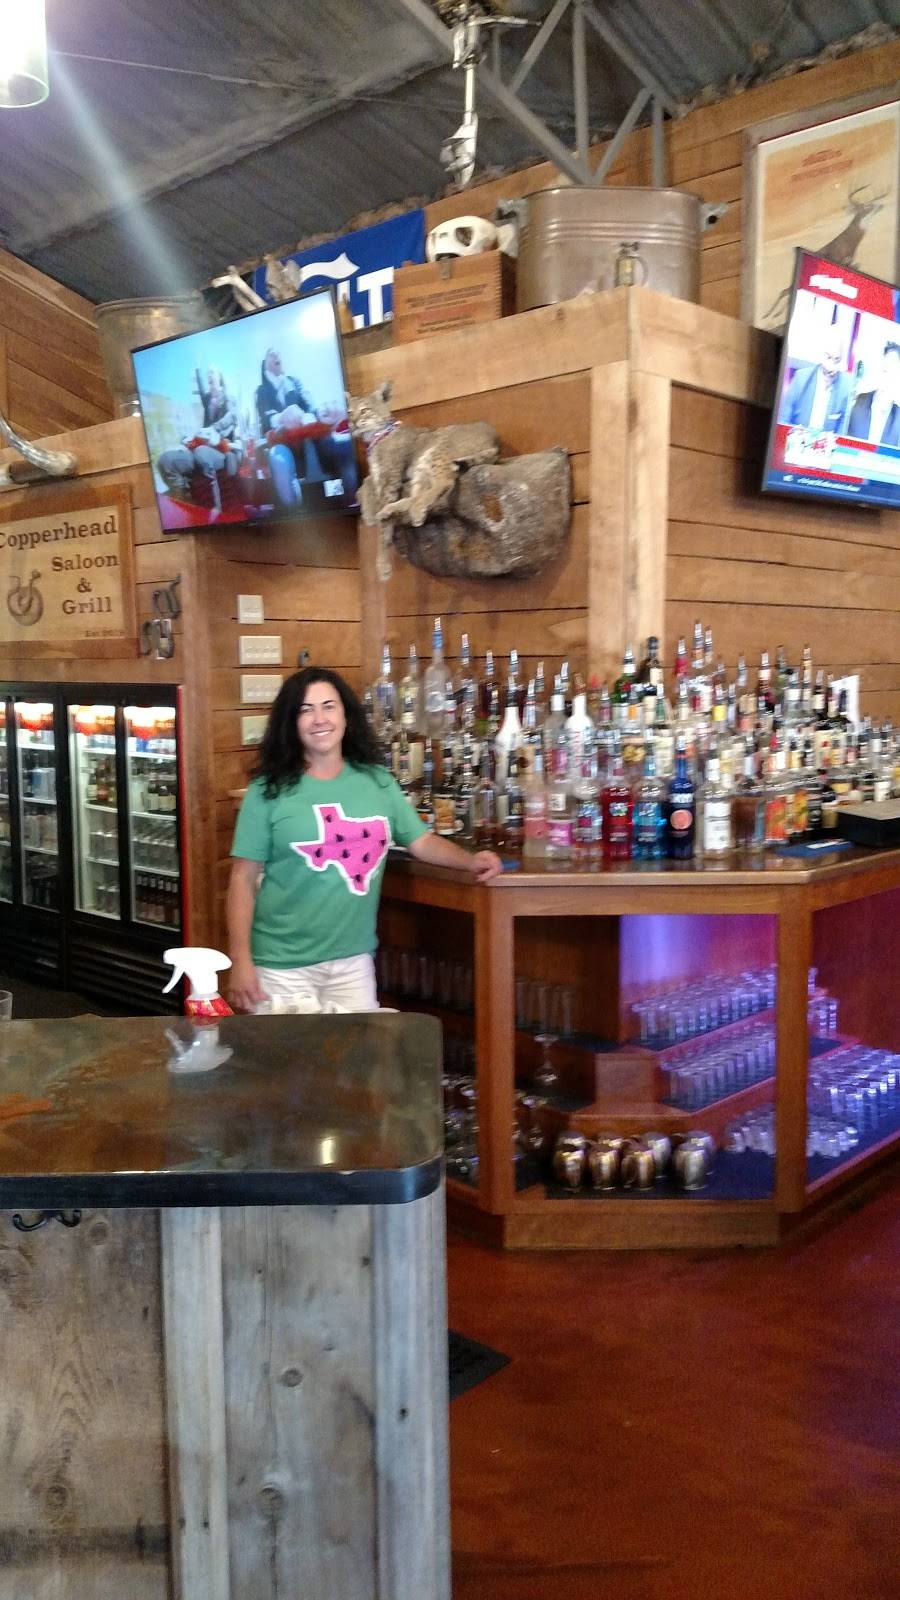 Copperhead Saloon & Grill   restaurant   802 IA-175, Stratford, IA 50249, USA   5158381972 OR +1 515-838-1972